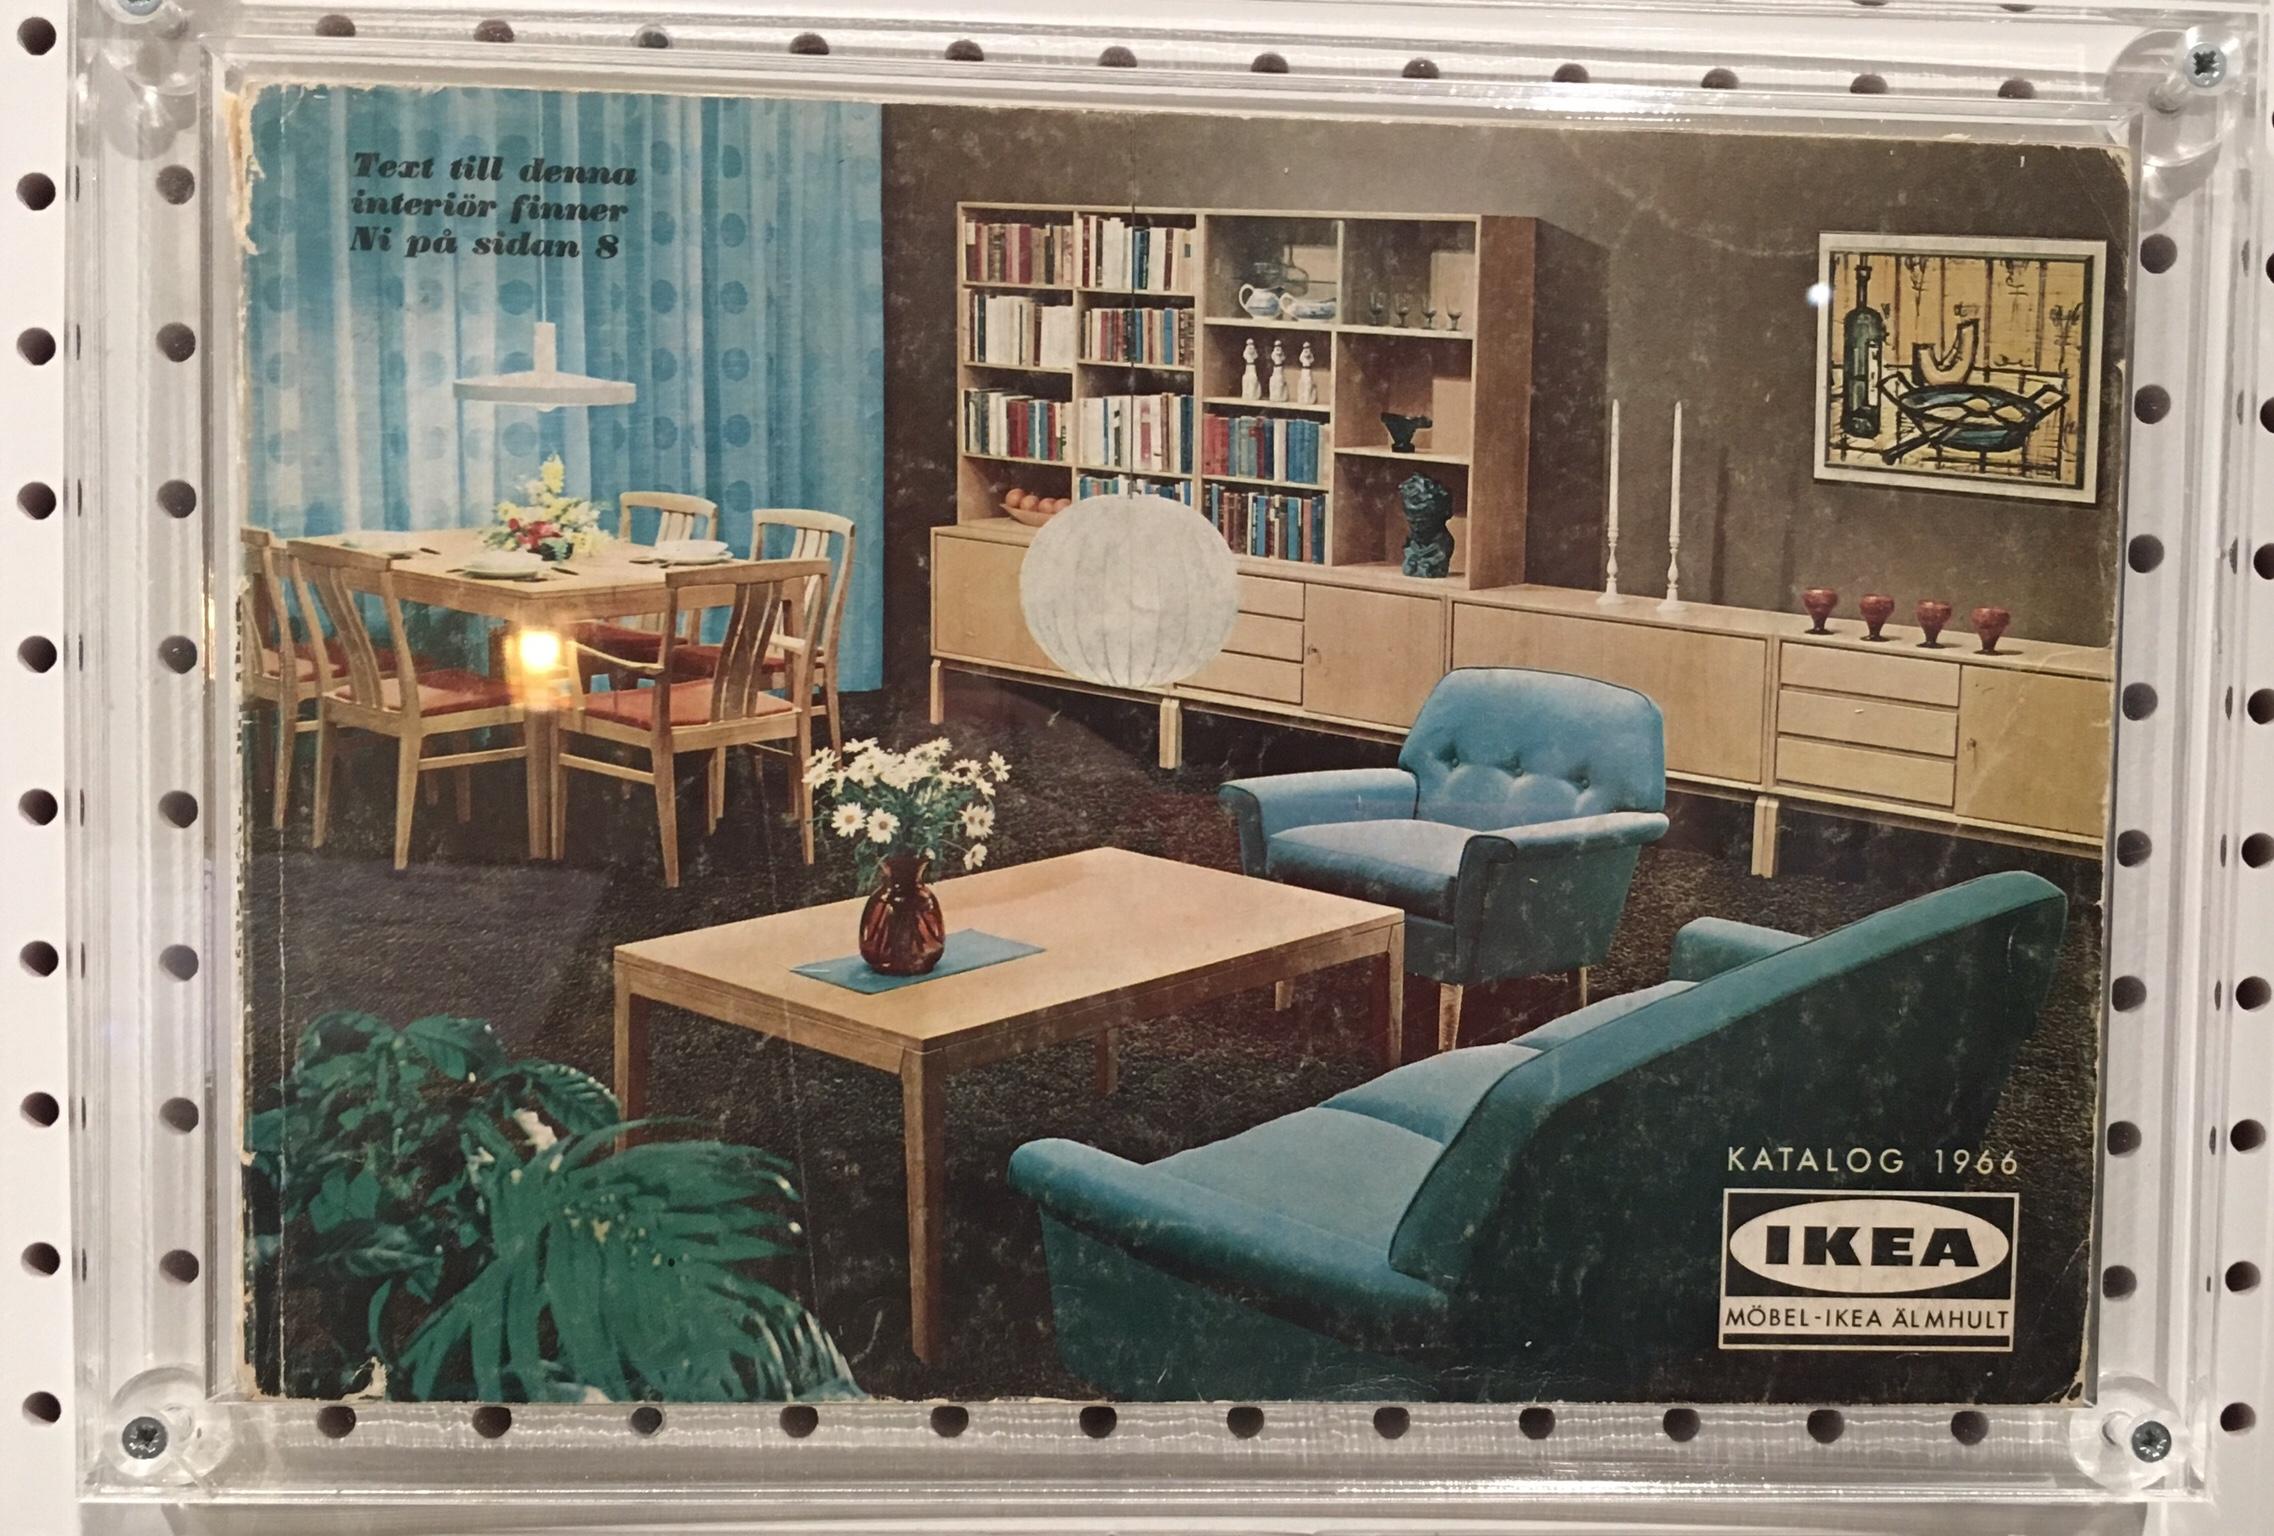 – Igelings MuseumKataloge Ikea 1961 1989 Reiseblog DW92IHEY